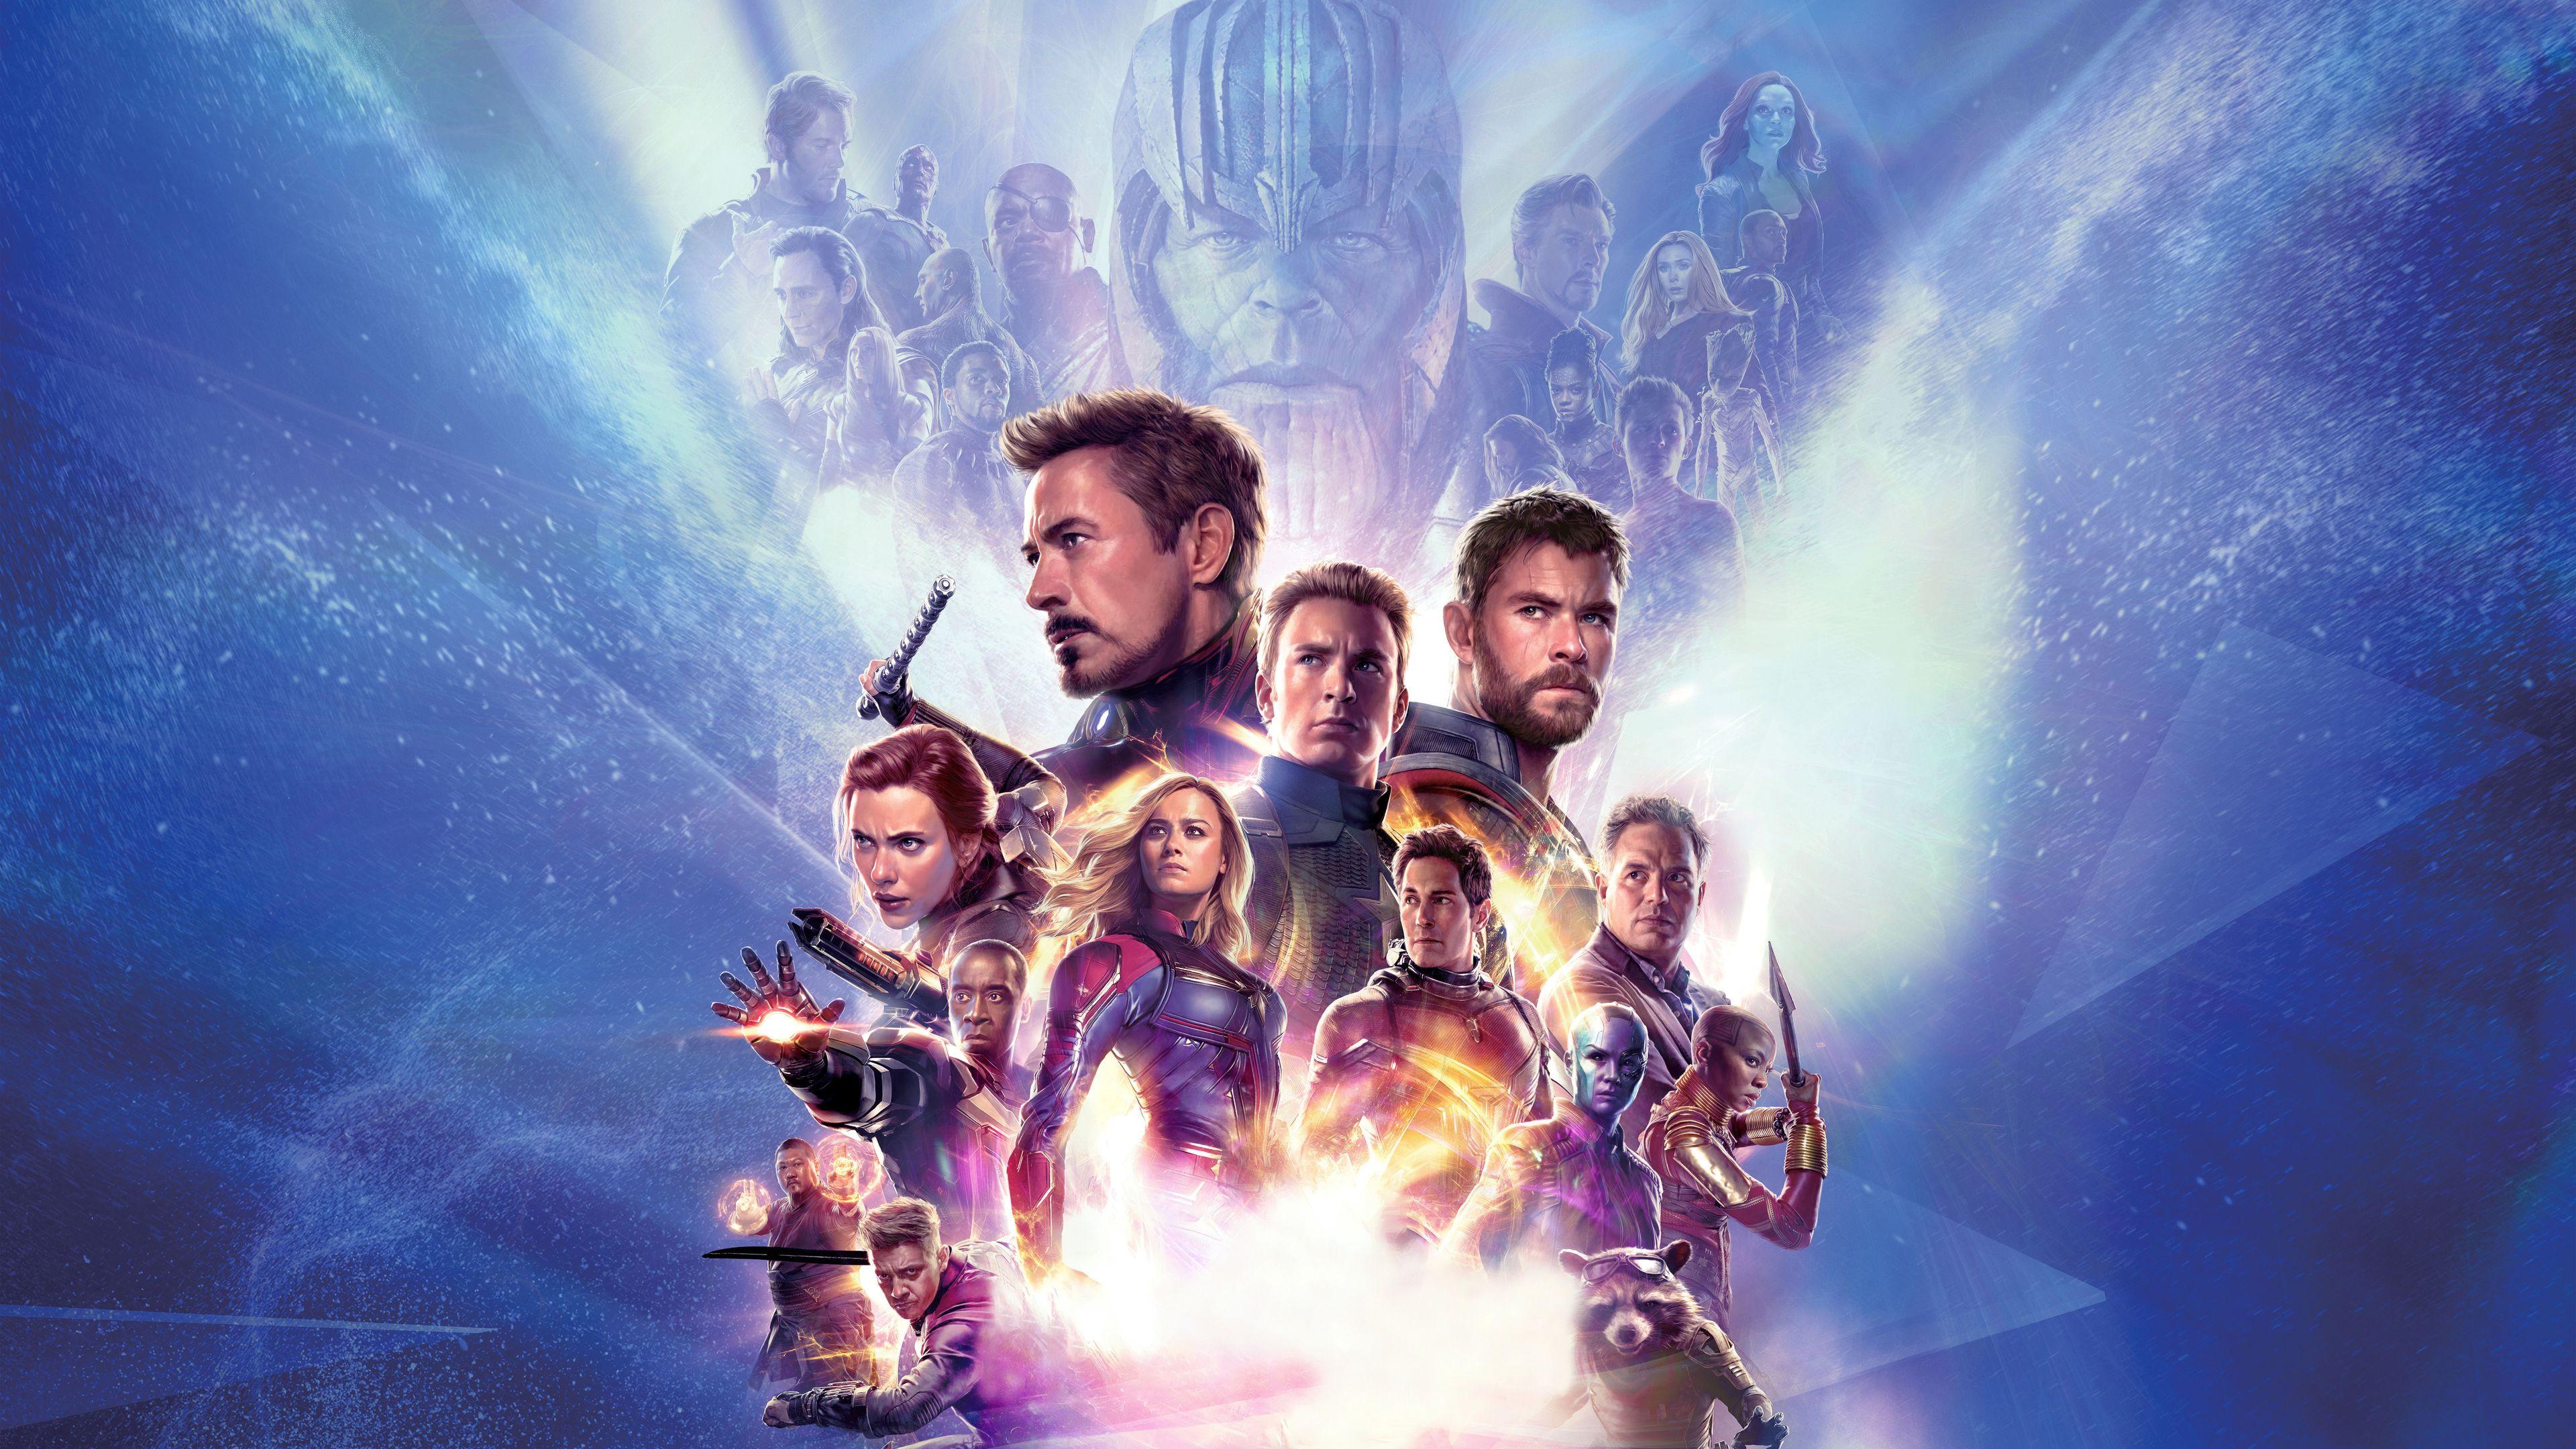 Avengers Endgame 2019 4k Movies Wallpapers Hd Wallpapers Avengers Wallpapers Avengers Endgame Wallpapers 4k Wallpapers 20 Avengers Marvel Movie Wallpapers